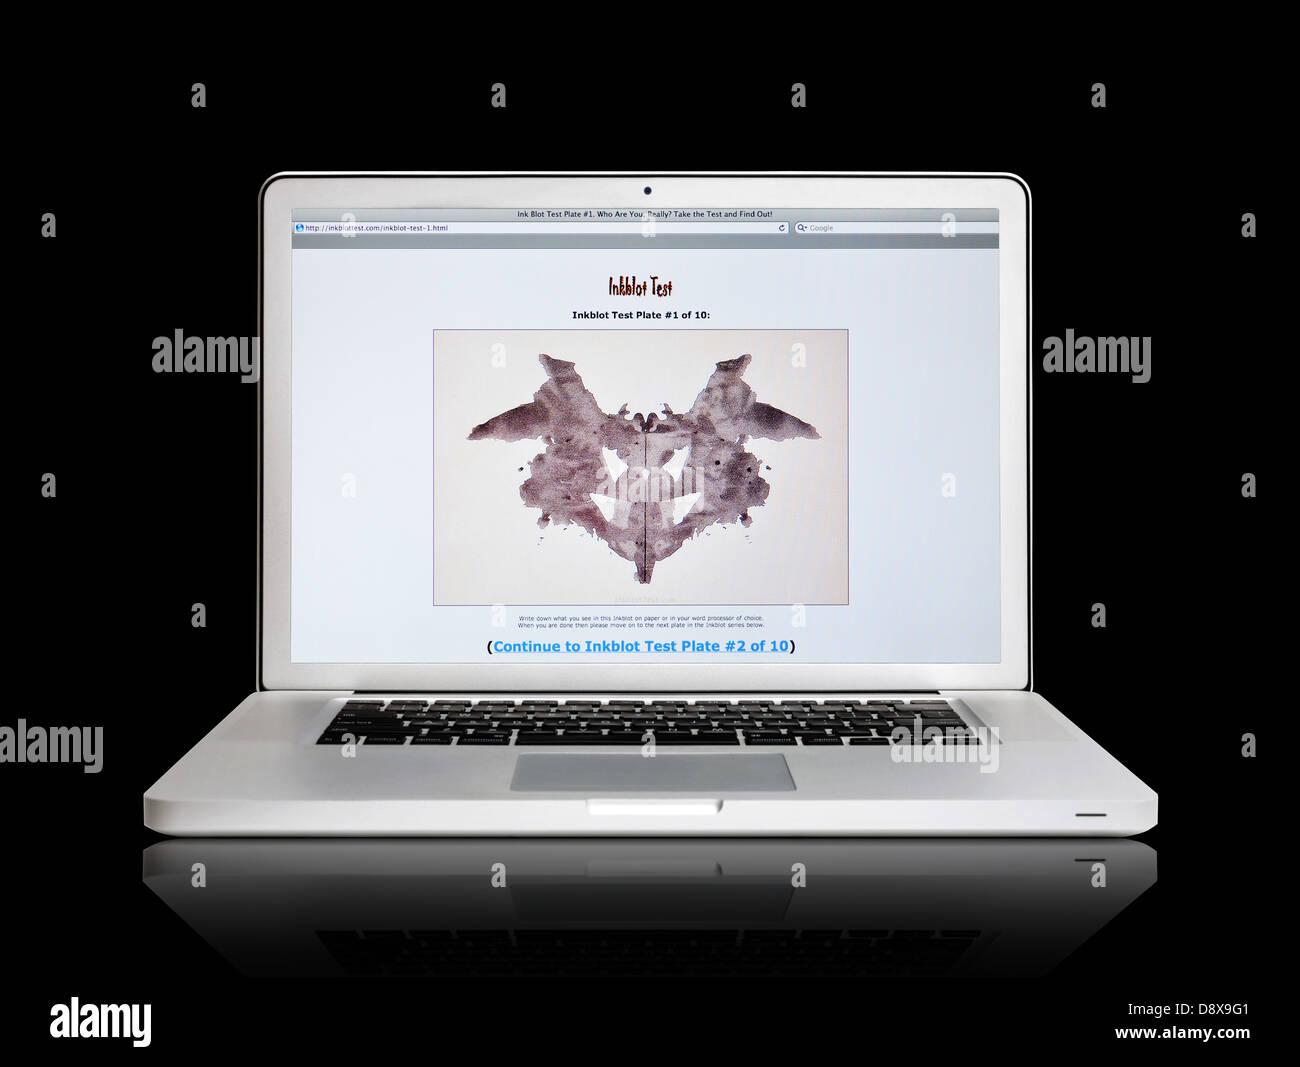 Laptop Screen Showing Inkblot Test Website Stock Photo Alamy